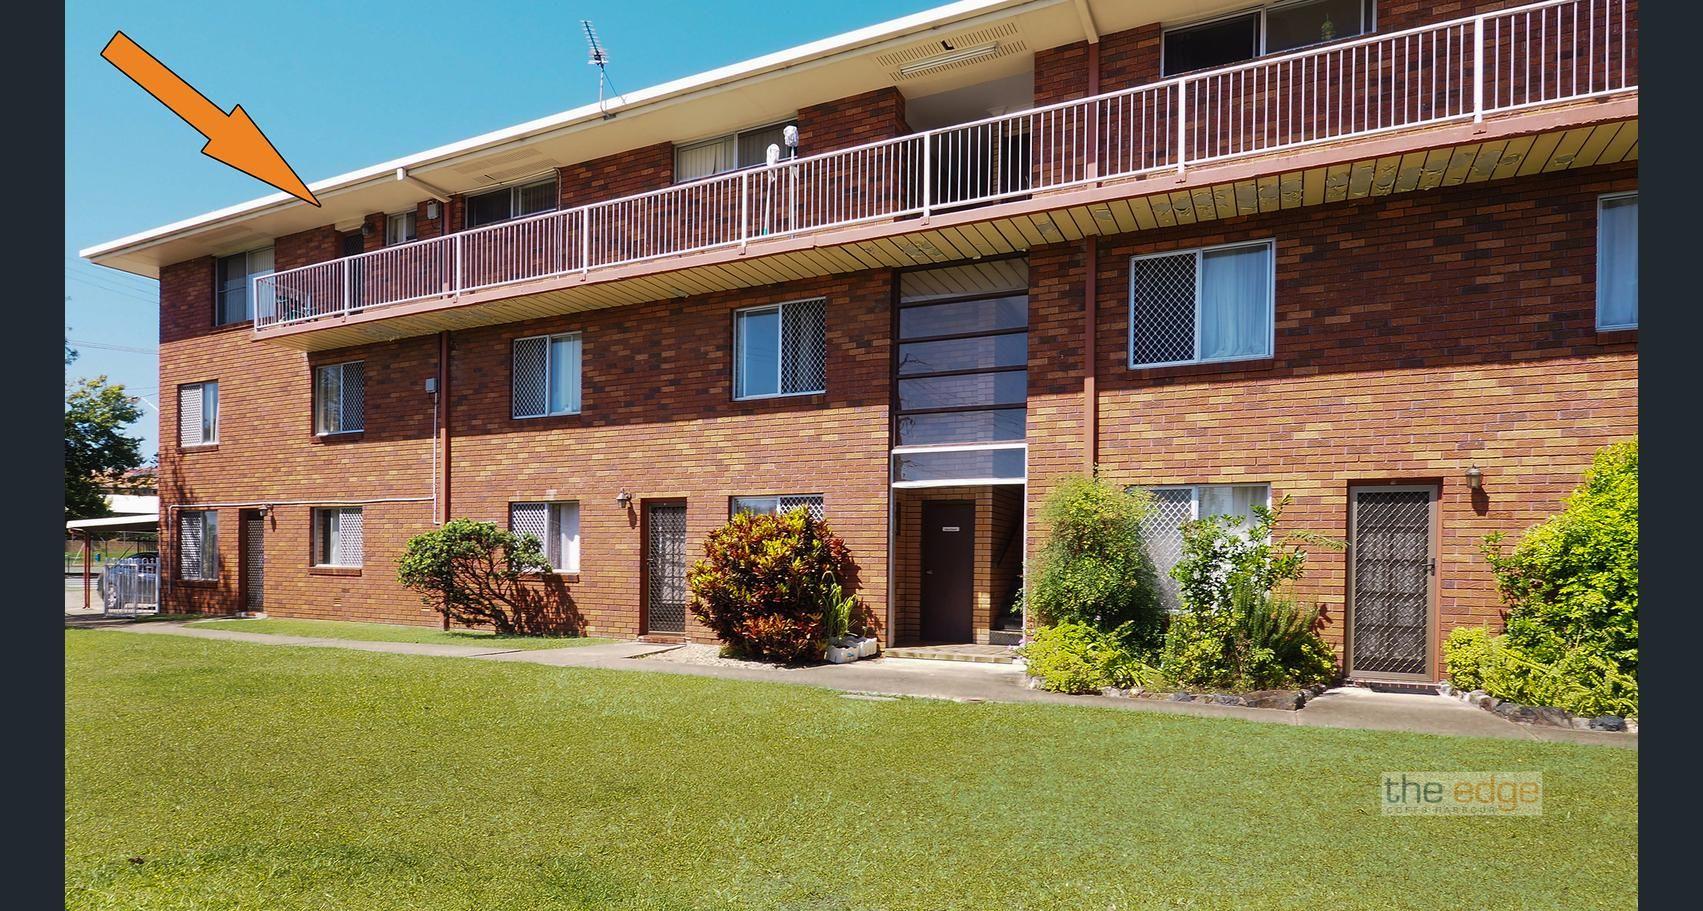 14A/35 Grafton Street, Coffs Harbour NSW 2450, Image 0